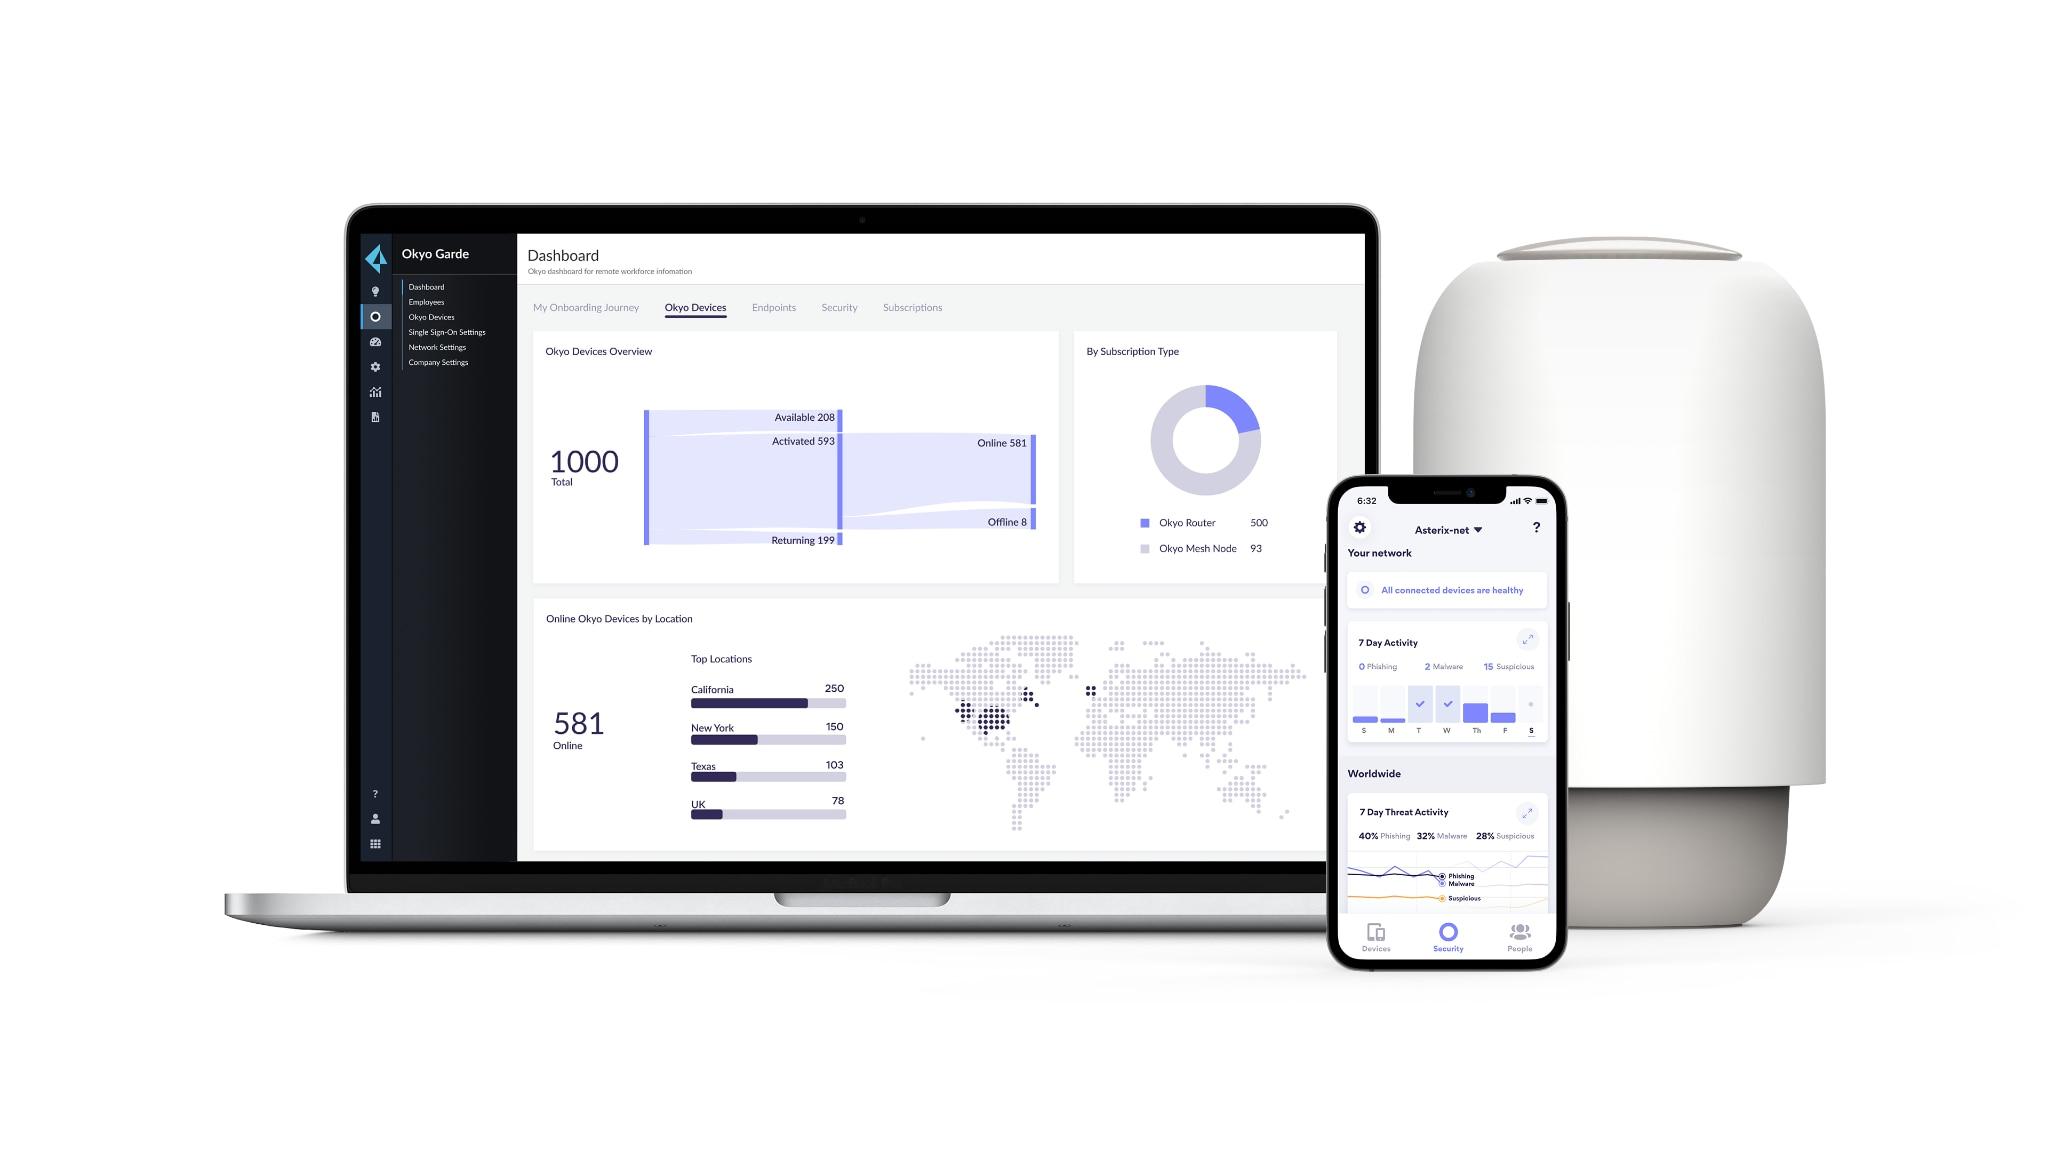 Image of Okyo Gard with screenshot of online dashboard.